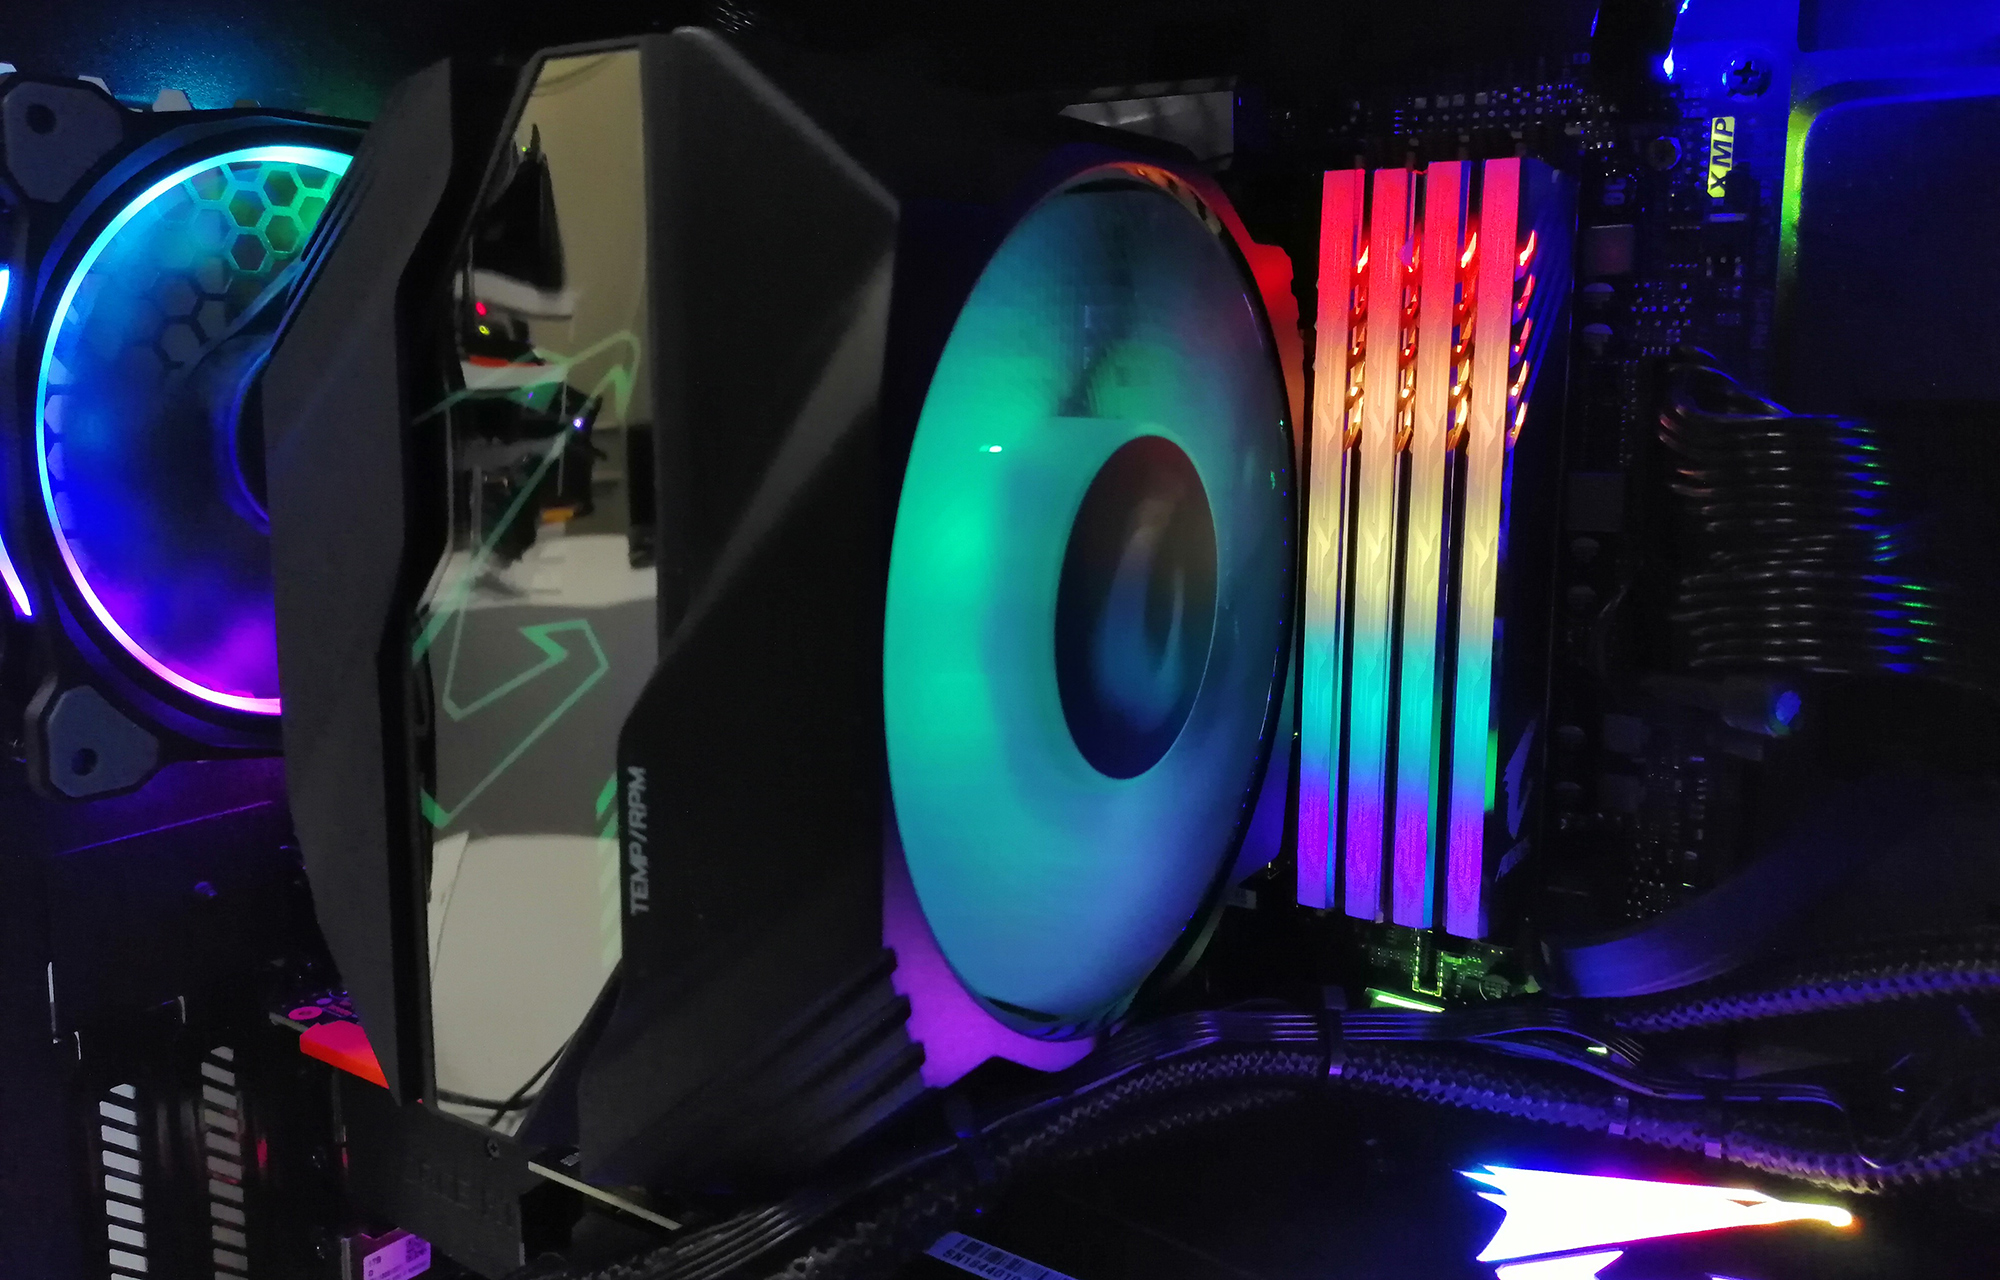 GIGABYTE Aorus RGB Memory Hits DDR4-4000 with SK Hynix ICs